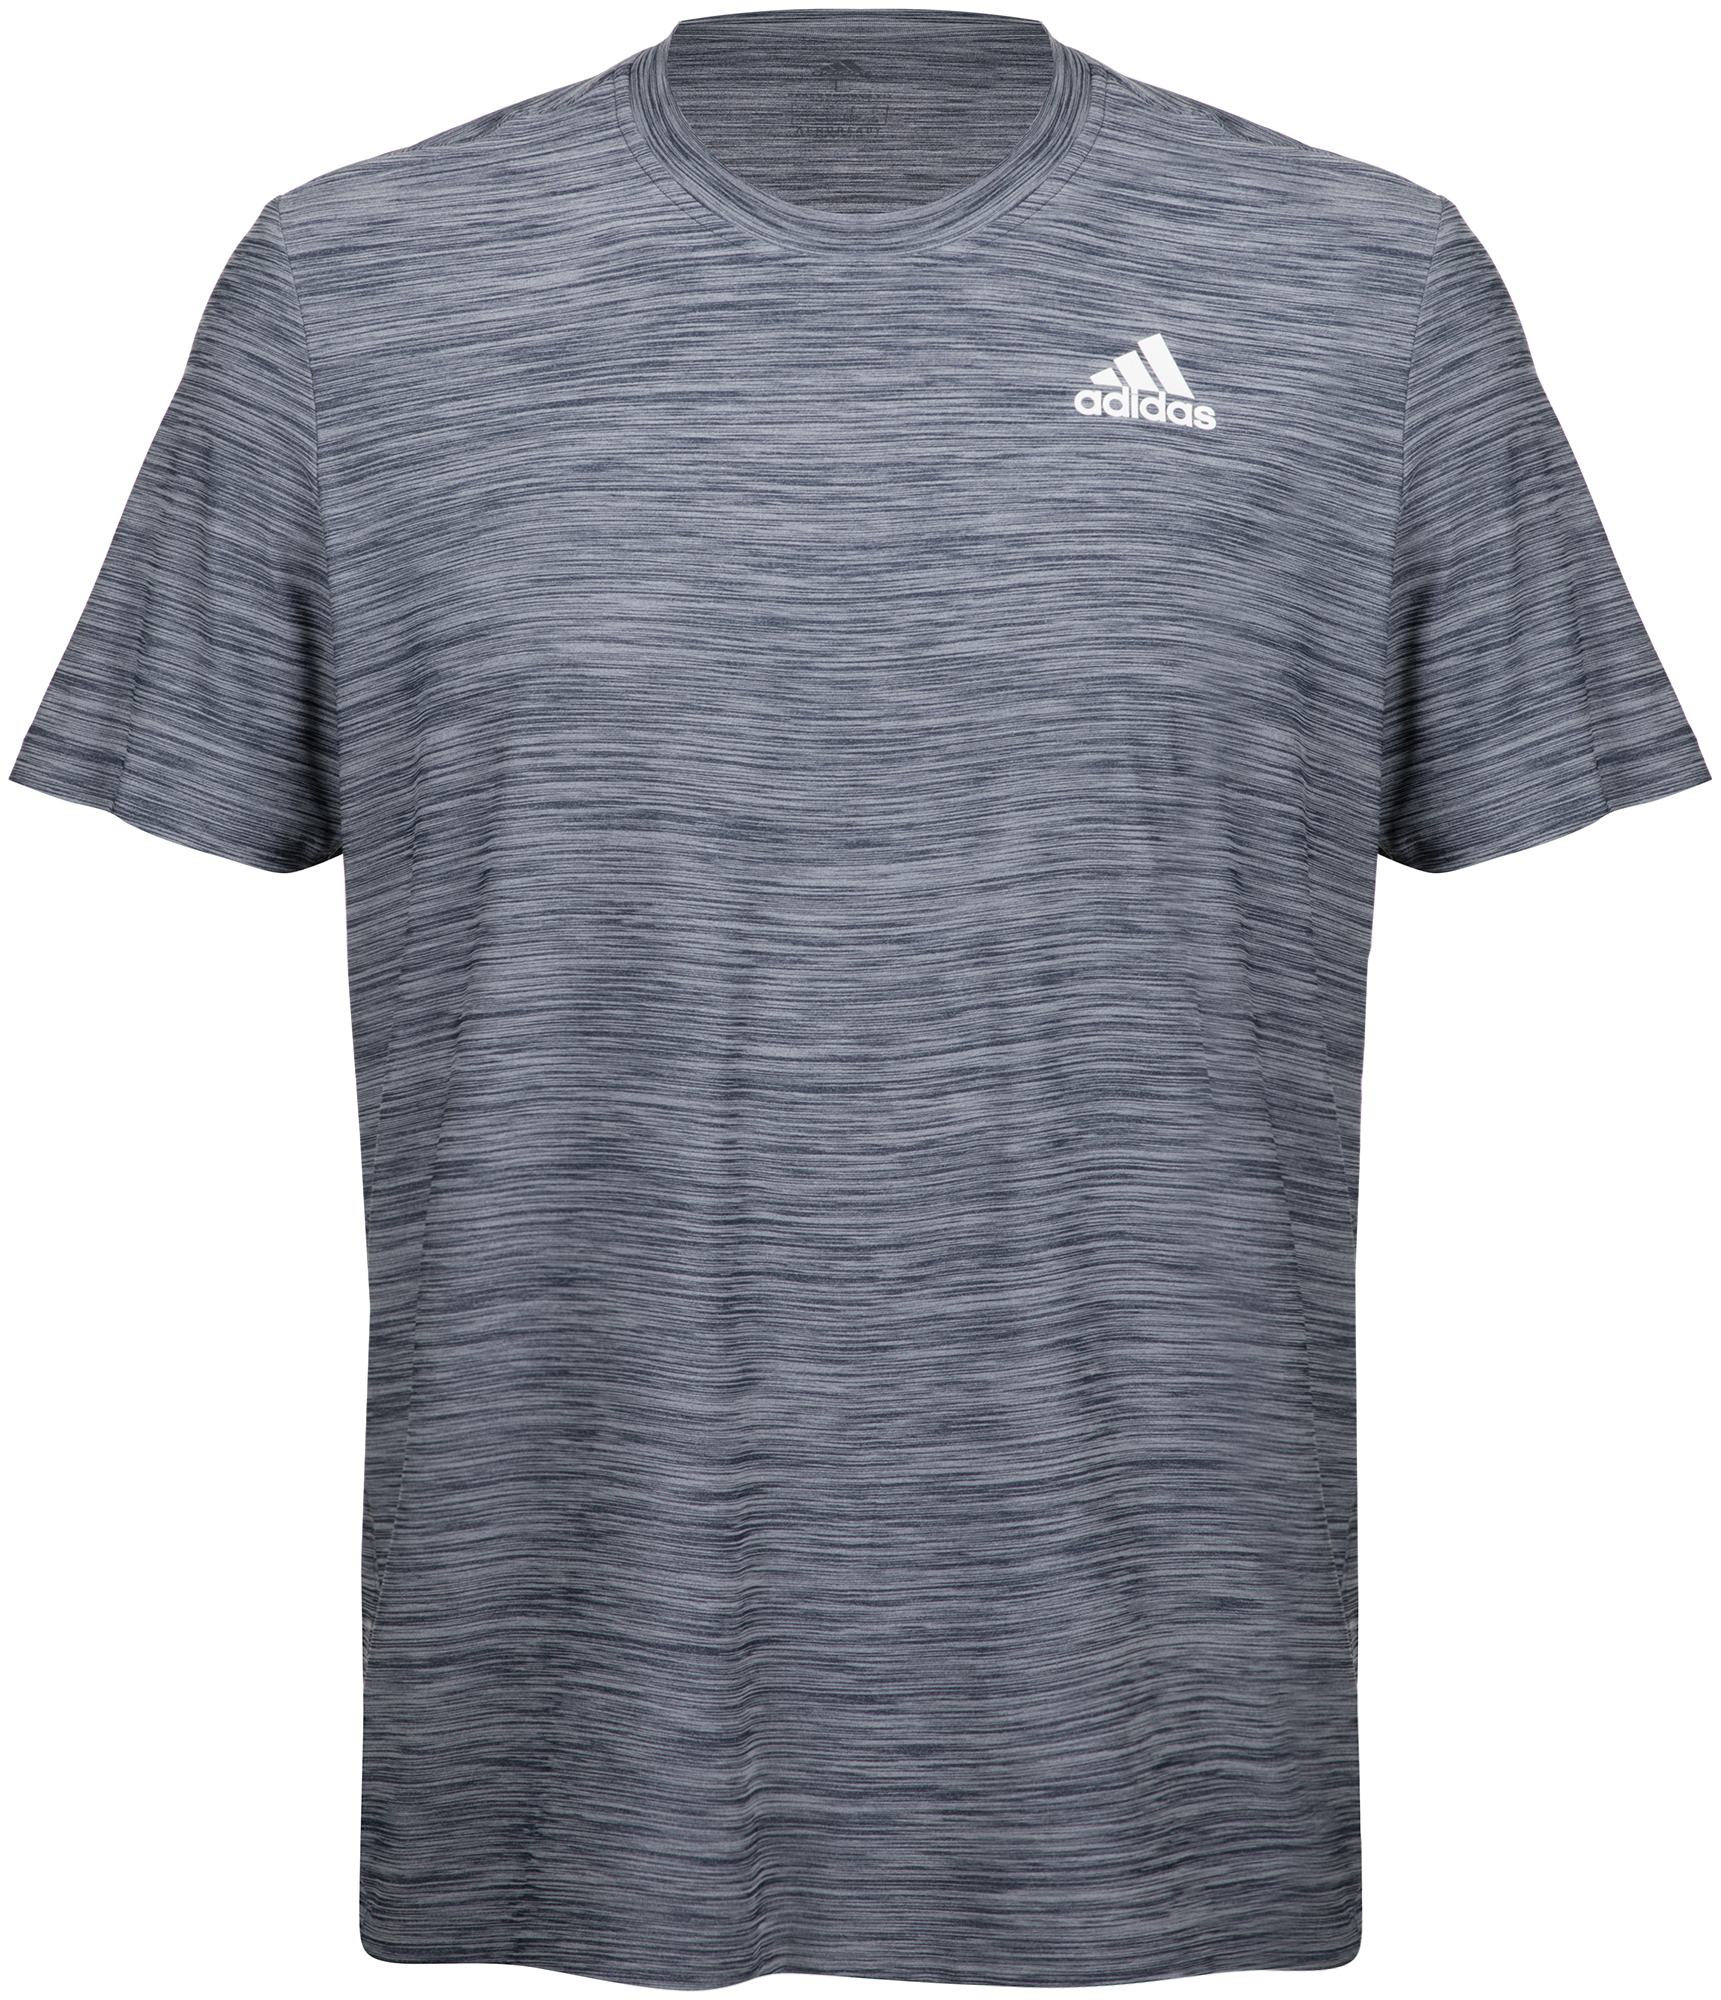 Adidas Футболка мужская adidas All Set, размер 52-54 adidas all court